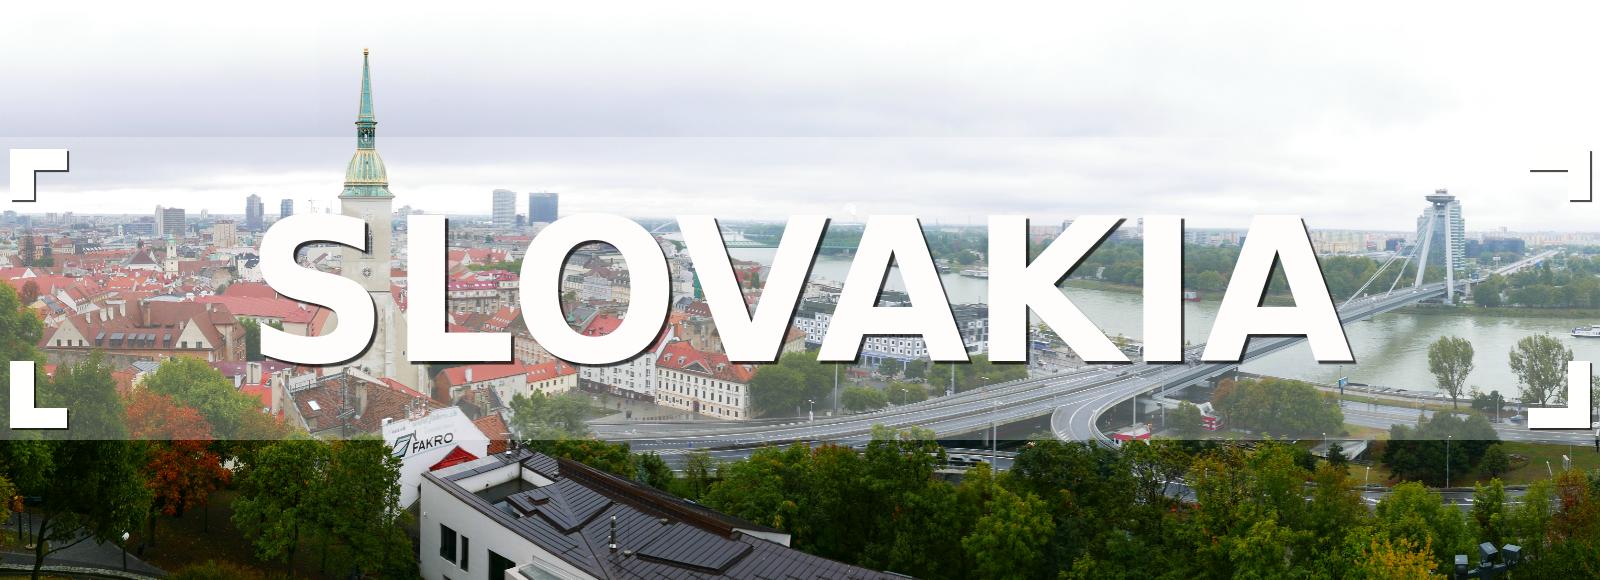 Destination: Slovakia